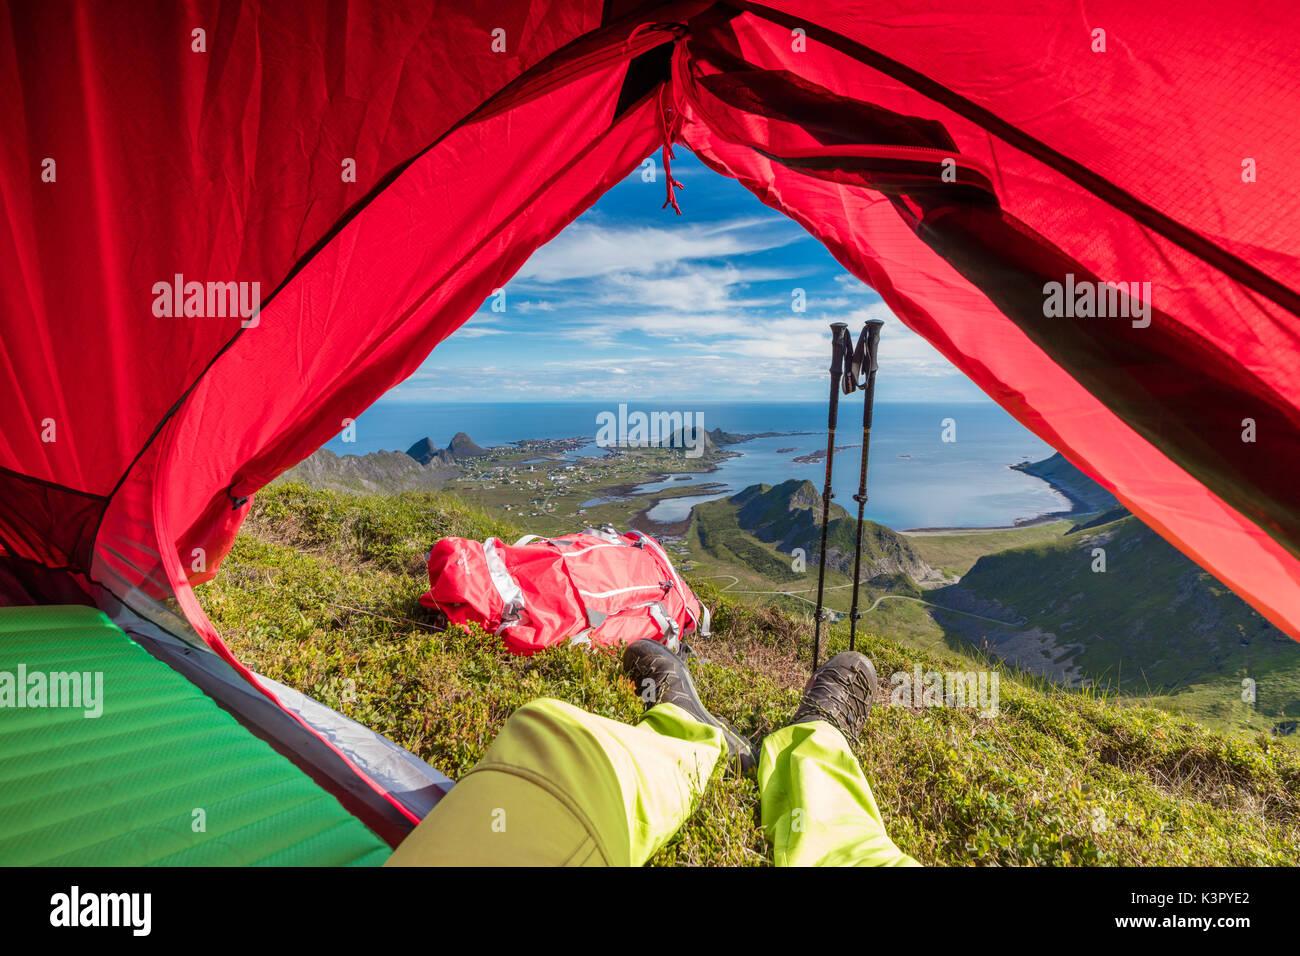 Tent and hiker on mountain top overlooking the sea Sorland Vaeroy Island Nordland county Lofoten archipelago Norway Europe - Stock Image